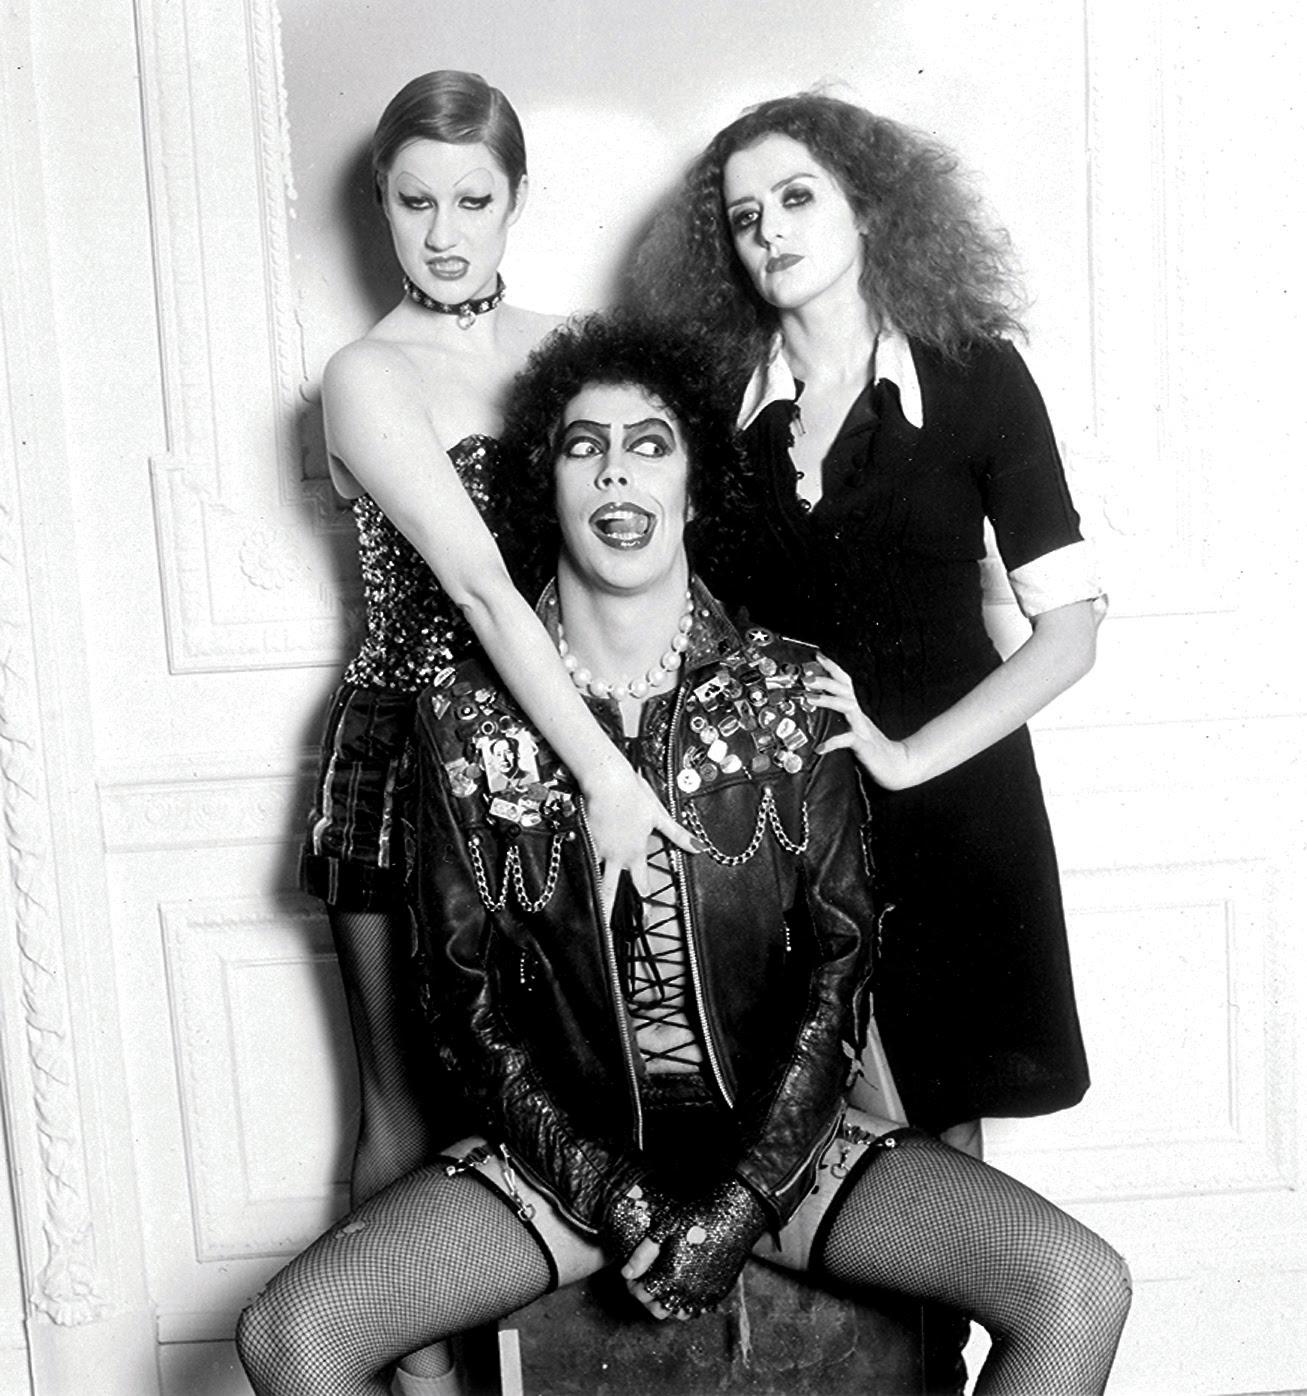 Rockymusic Rocky Horror Picture Show Still B W Photo Image